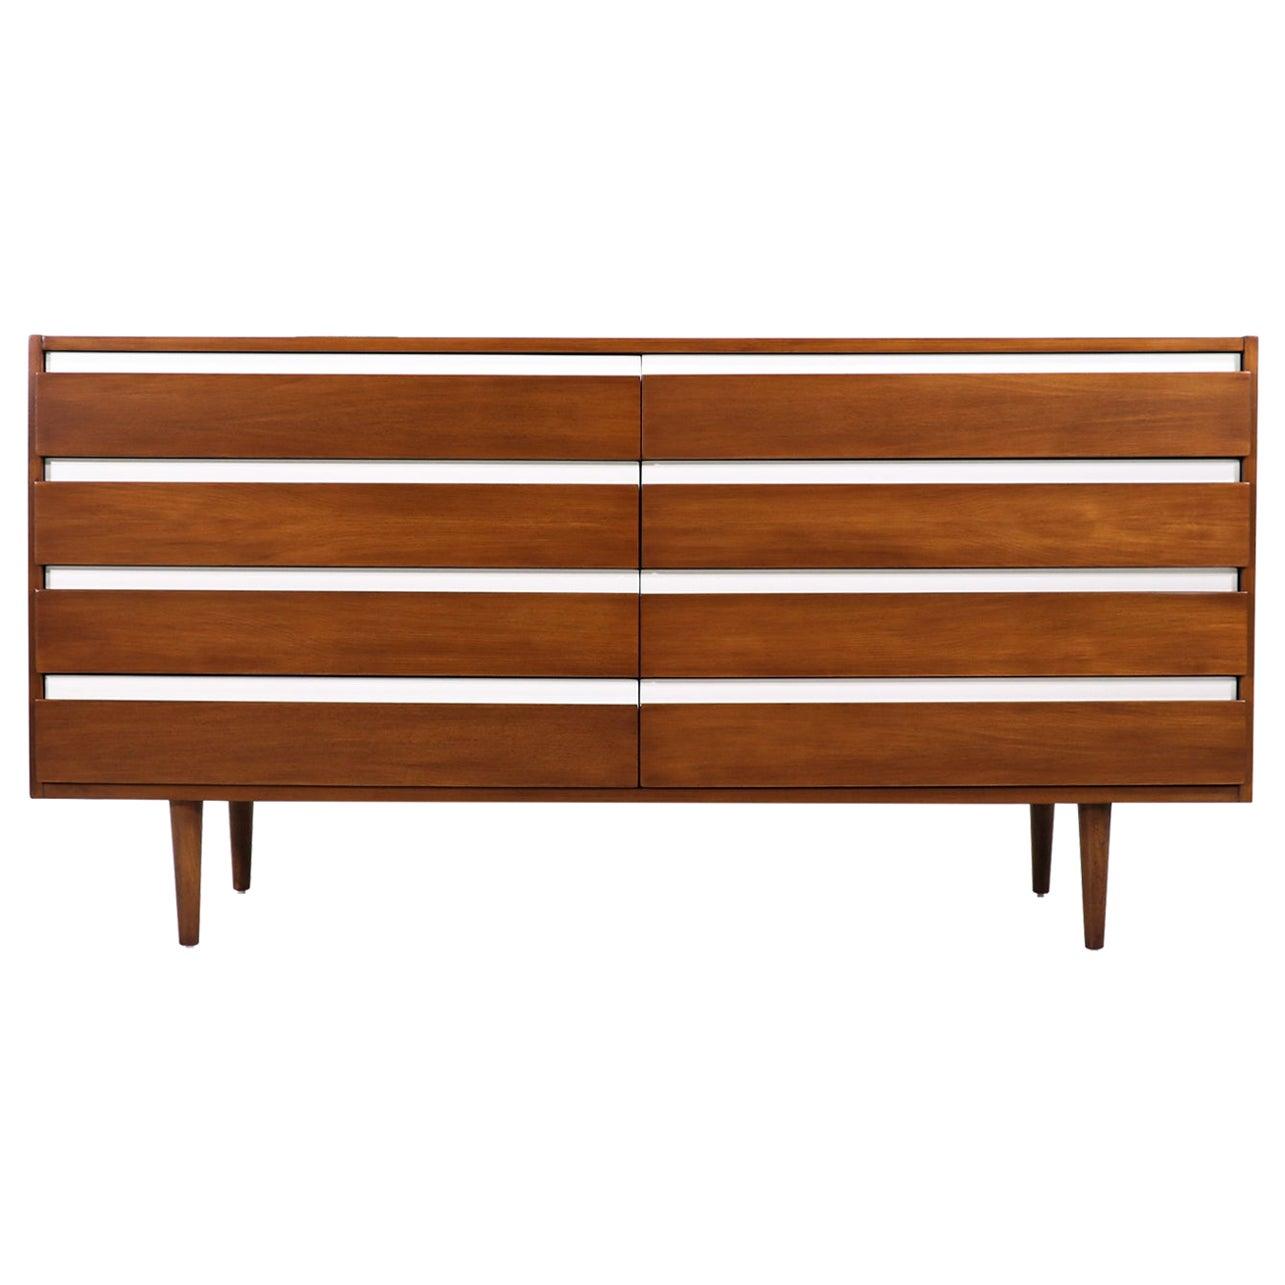 Mid-Century Modern 8-Drawer Dresser by American of Martinsville